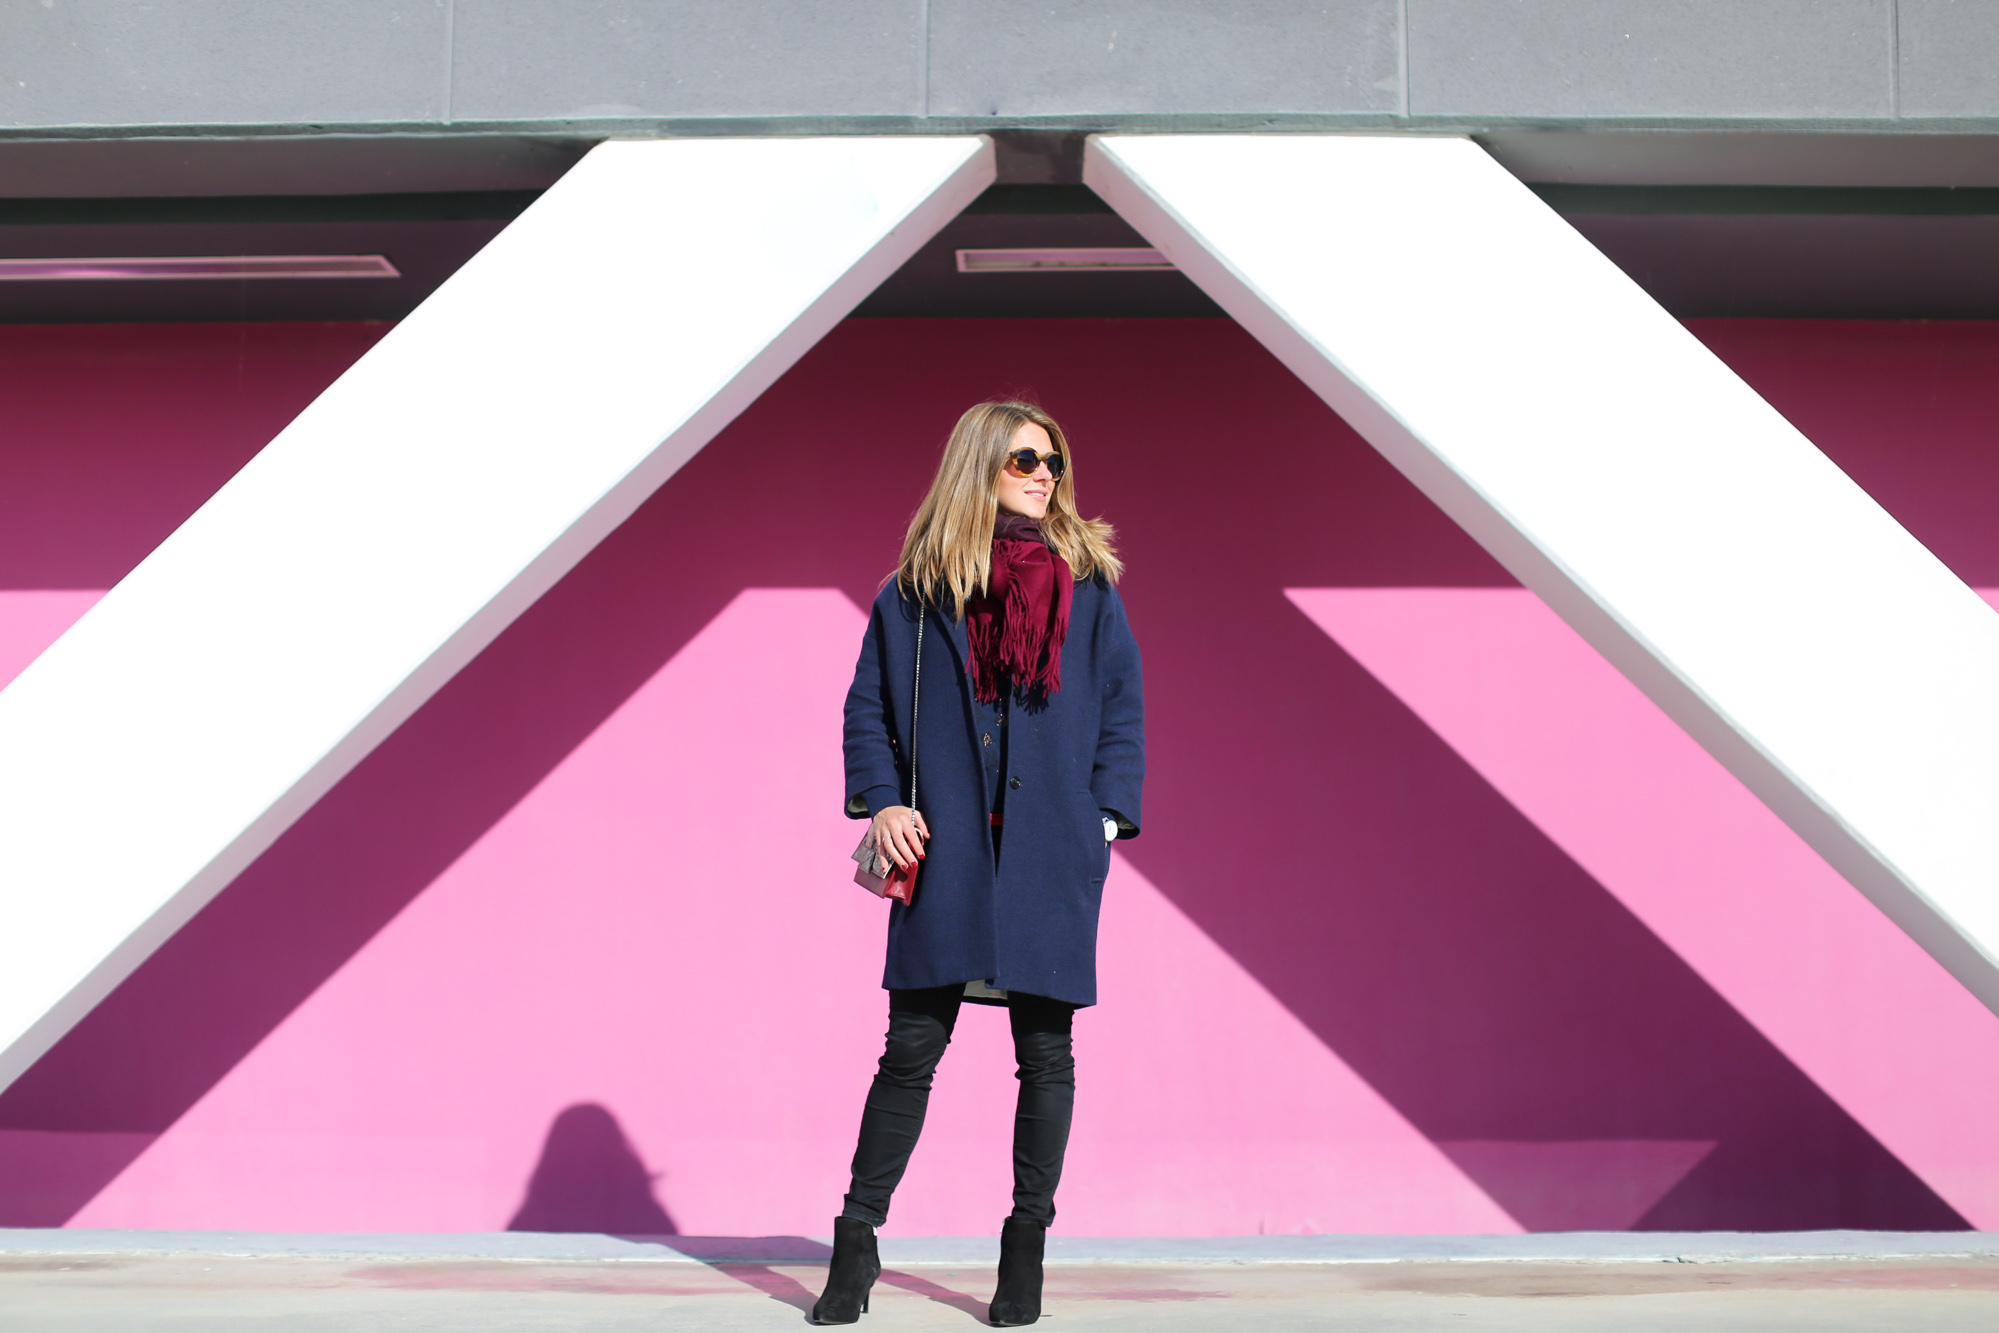 Clochet_fashionblogger_streetstyle_&otherstories_stilettoankleboots_burgundyheroscarf_metallicflowerssweater_titamadridspiga-2